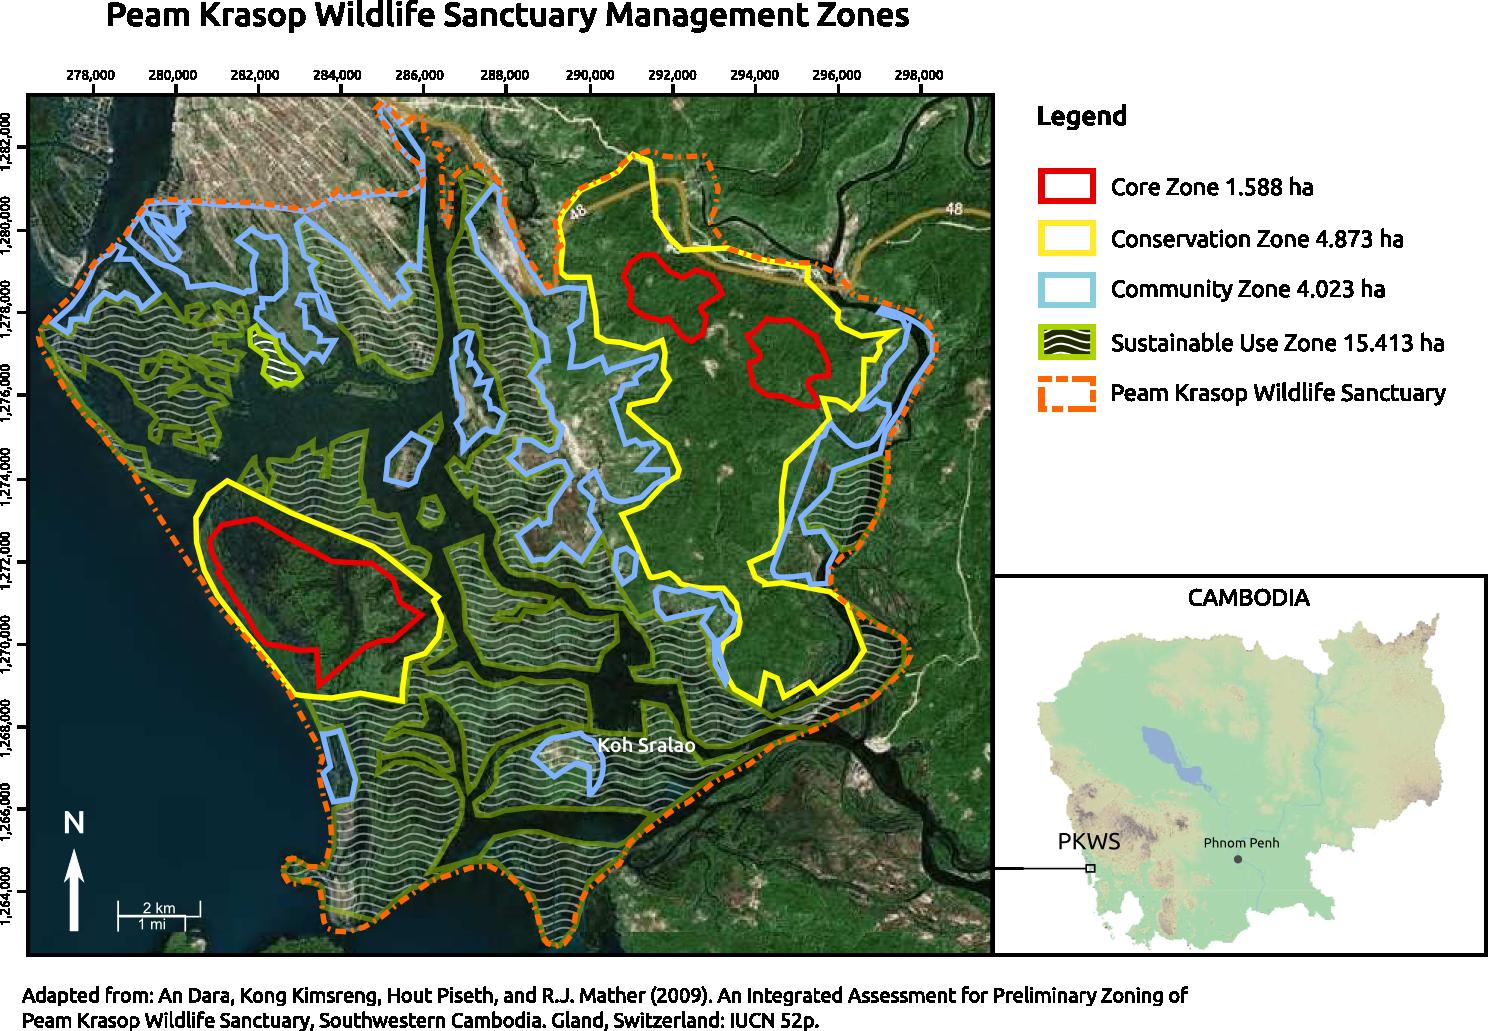 Map PKWS